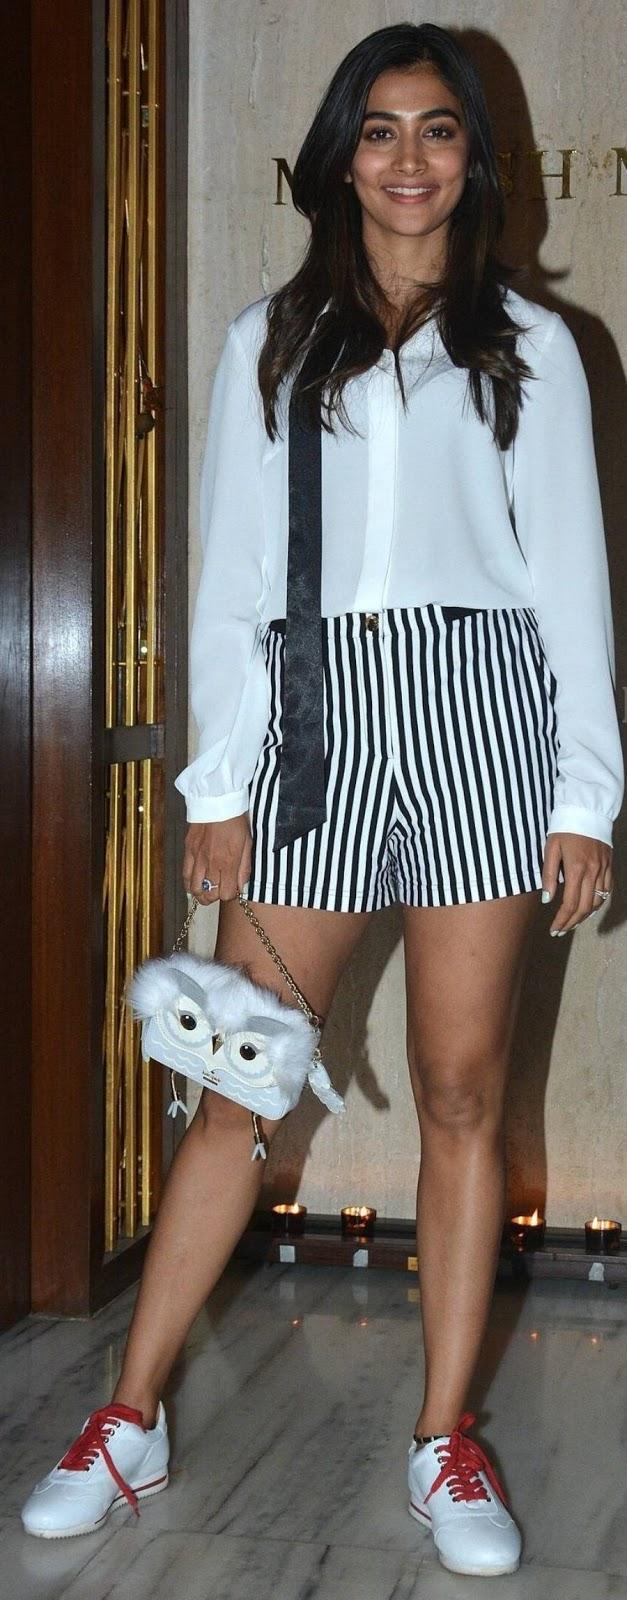 Indian Girl Pooja Hegde Long Legs Show In White Shirt